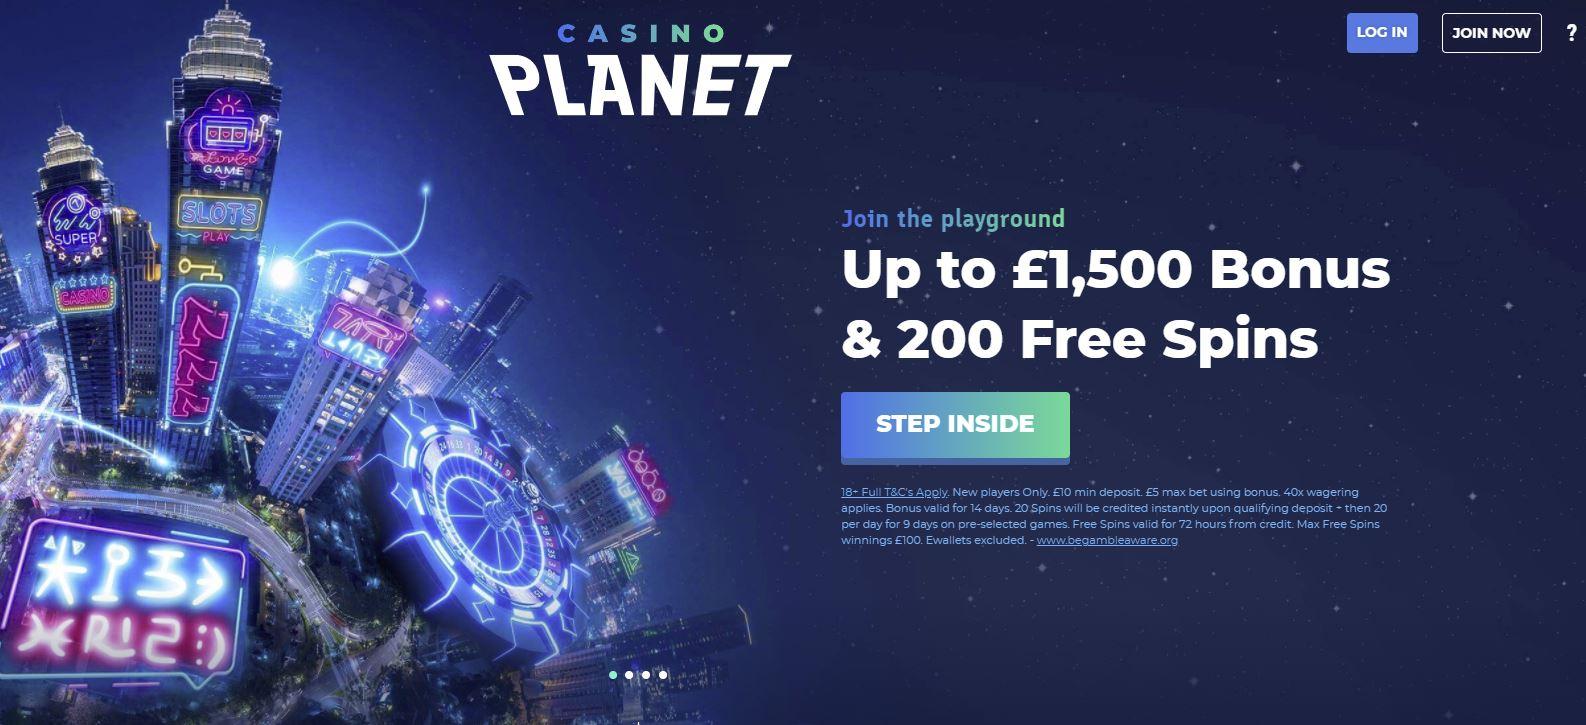 Casino Planet new customer offer